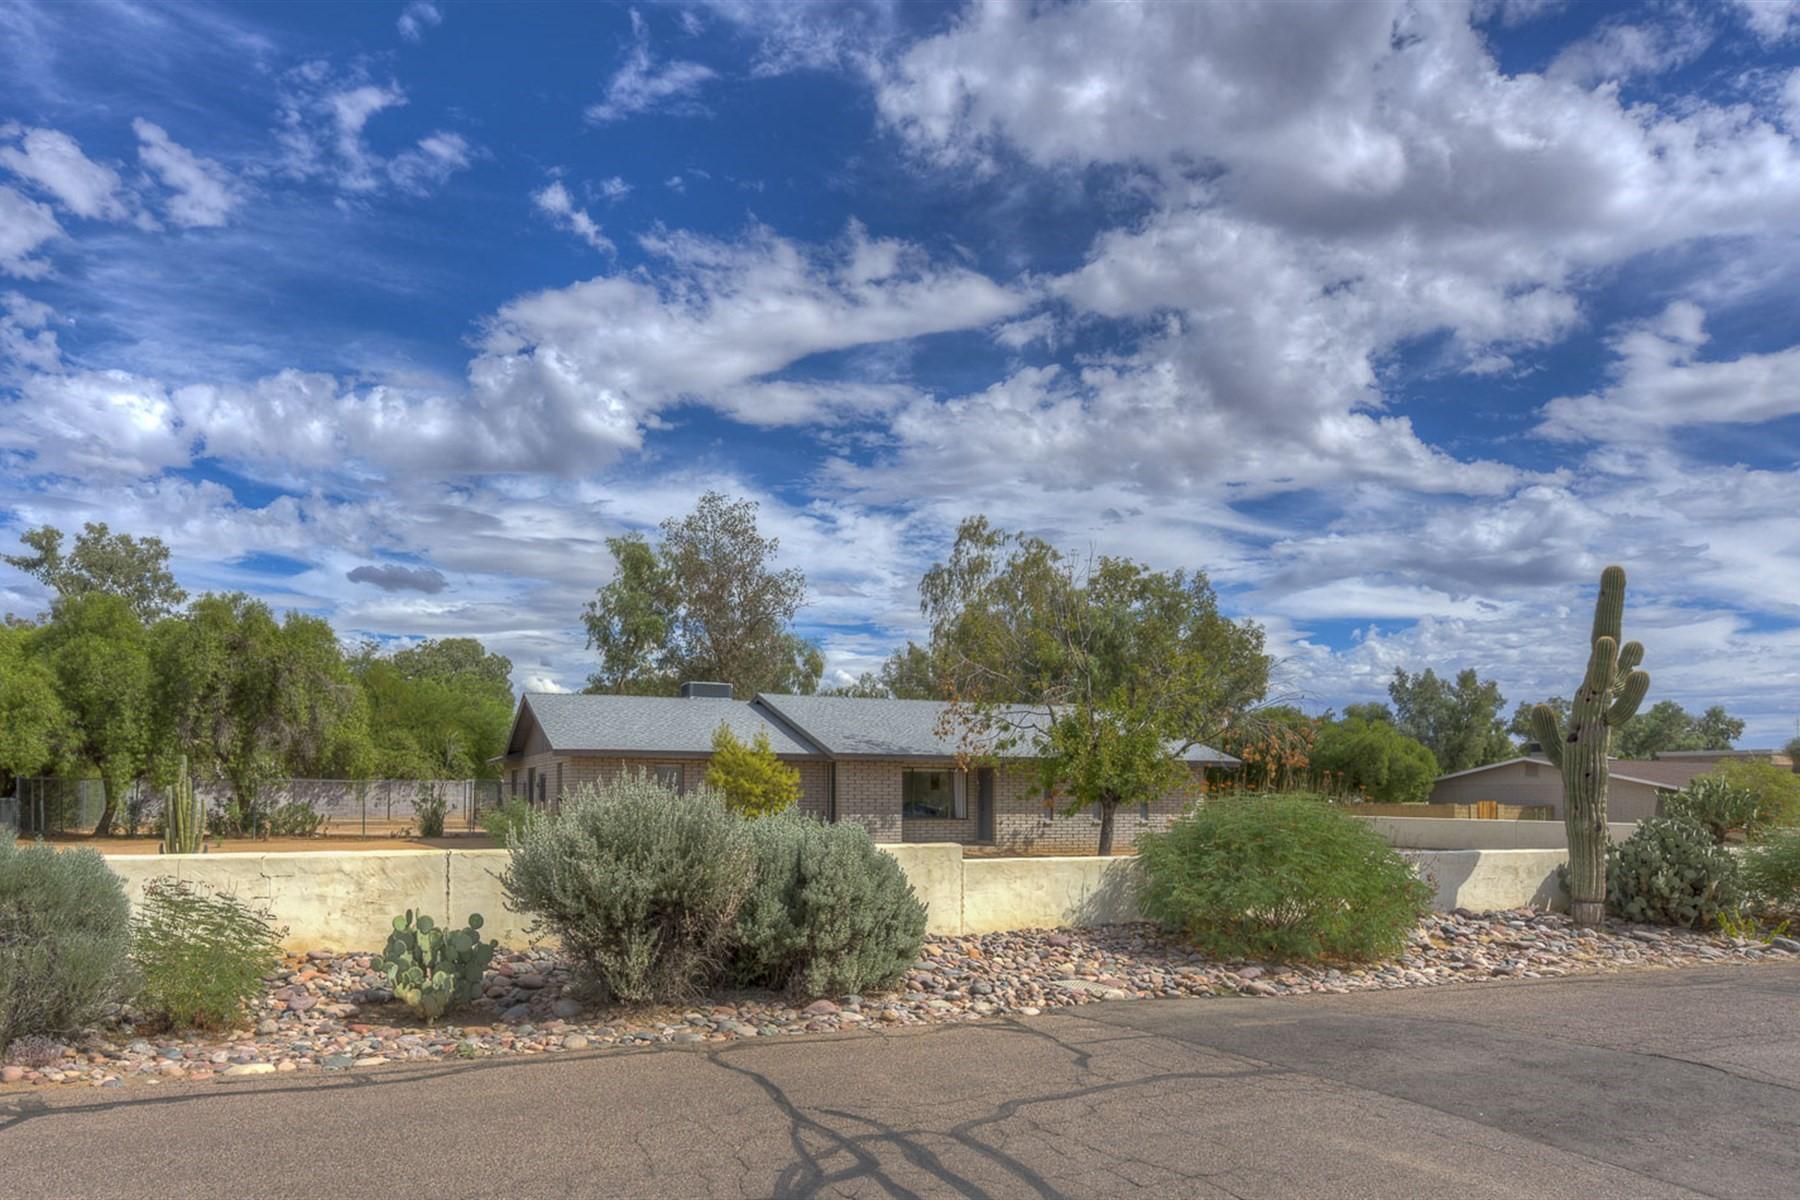 獨棟家庭住宅 為 出售 在 Immaculate home in Paradise Valley Ranchos 13613 N 76th St, Scottsdale, 亞利桑那州, 85260 美國